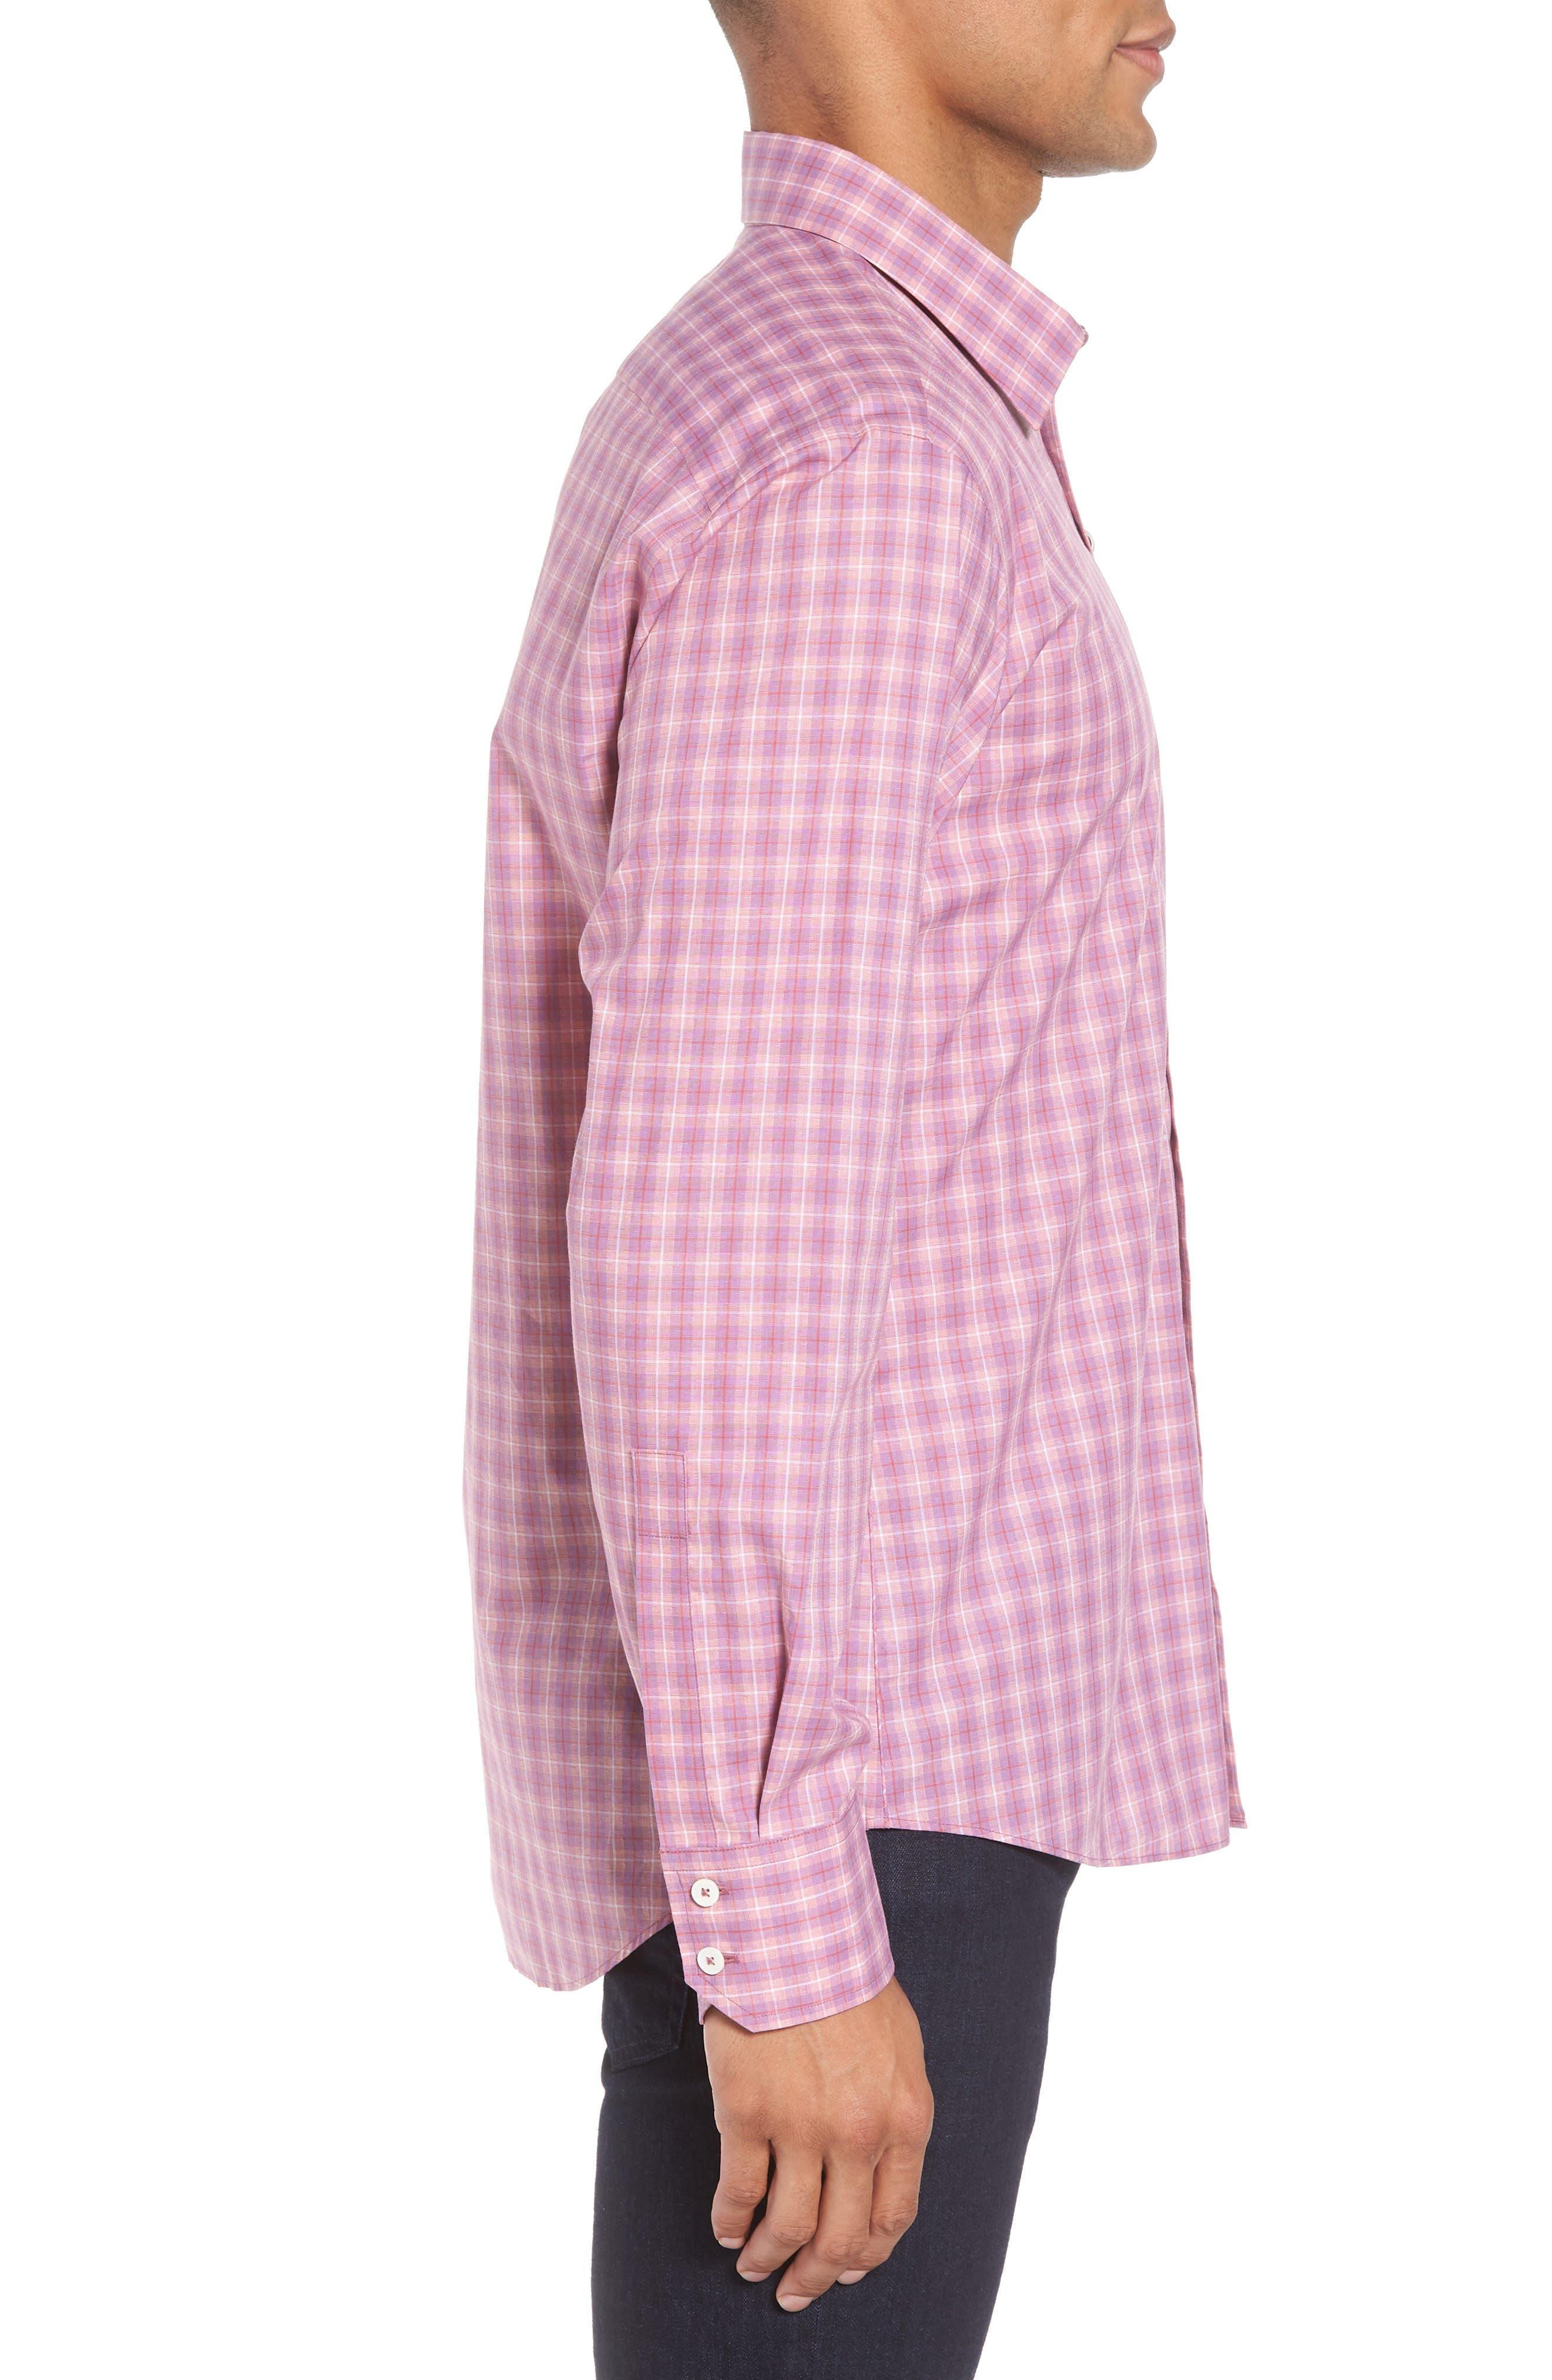 ZACHARY PRELL, Duran Regular Fit Sport Shirt, Alternate thumbnail 3, color, PINK